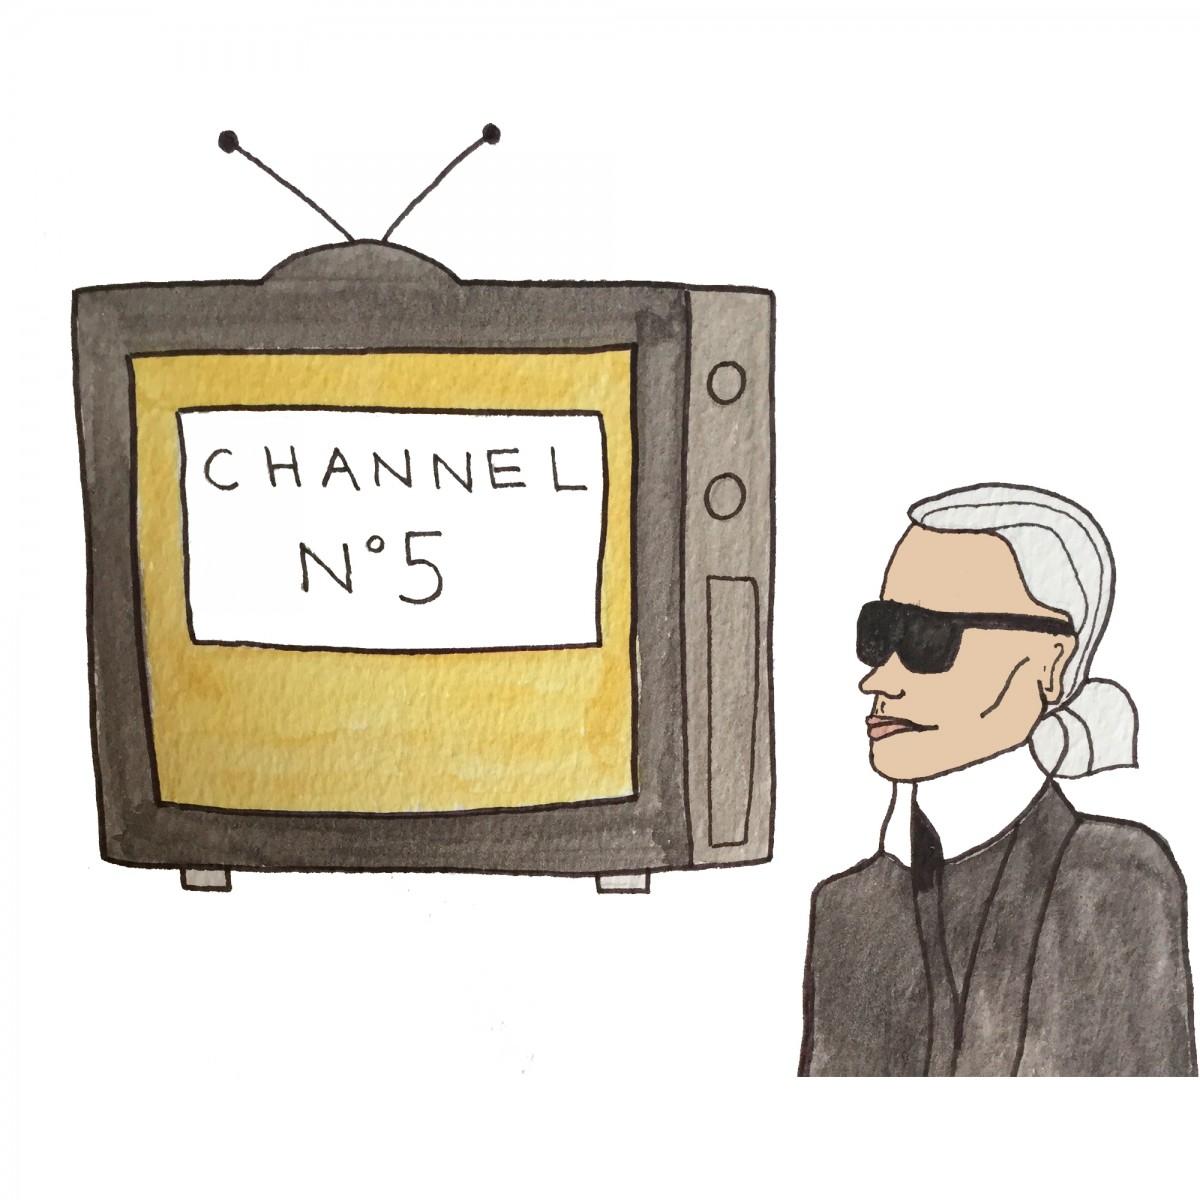 channelno5